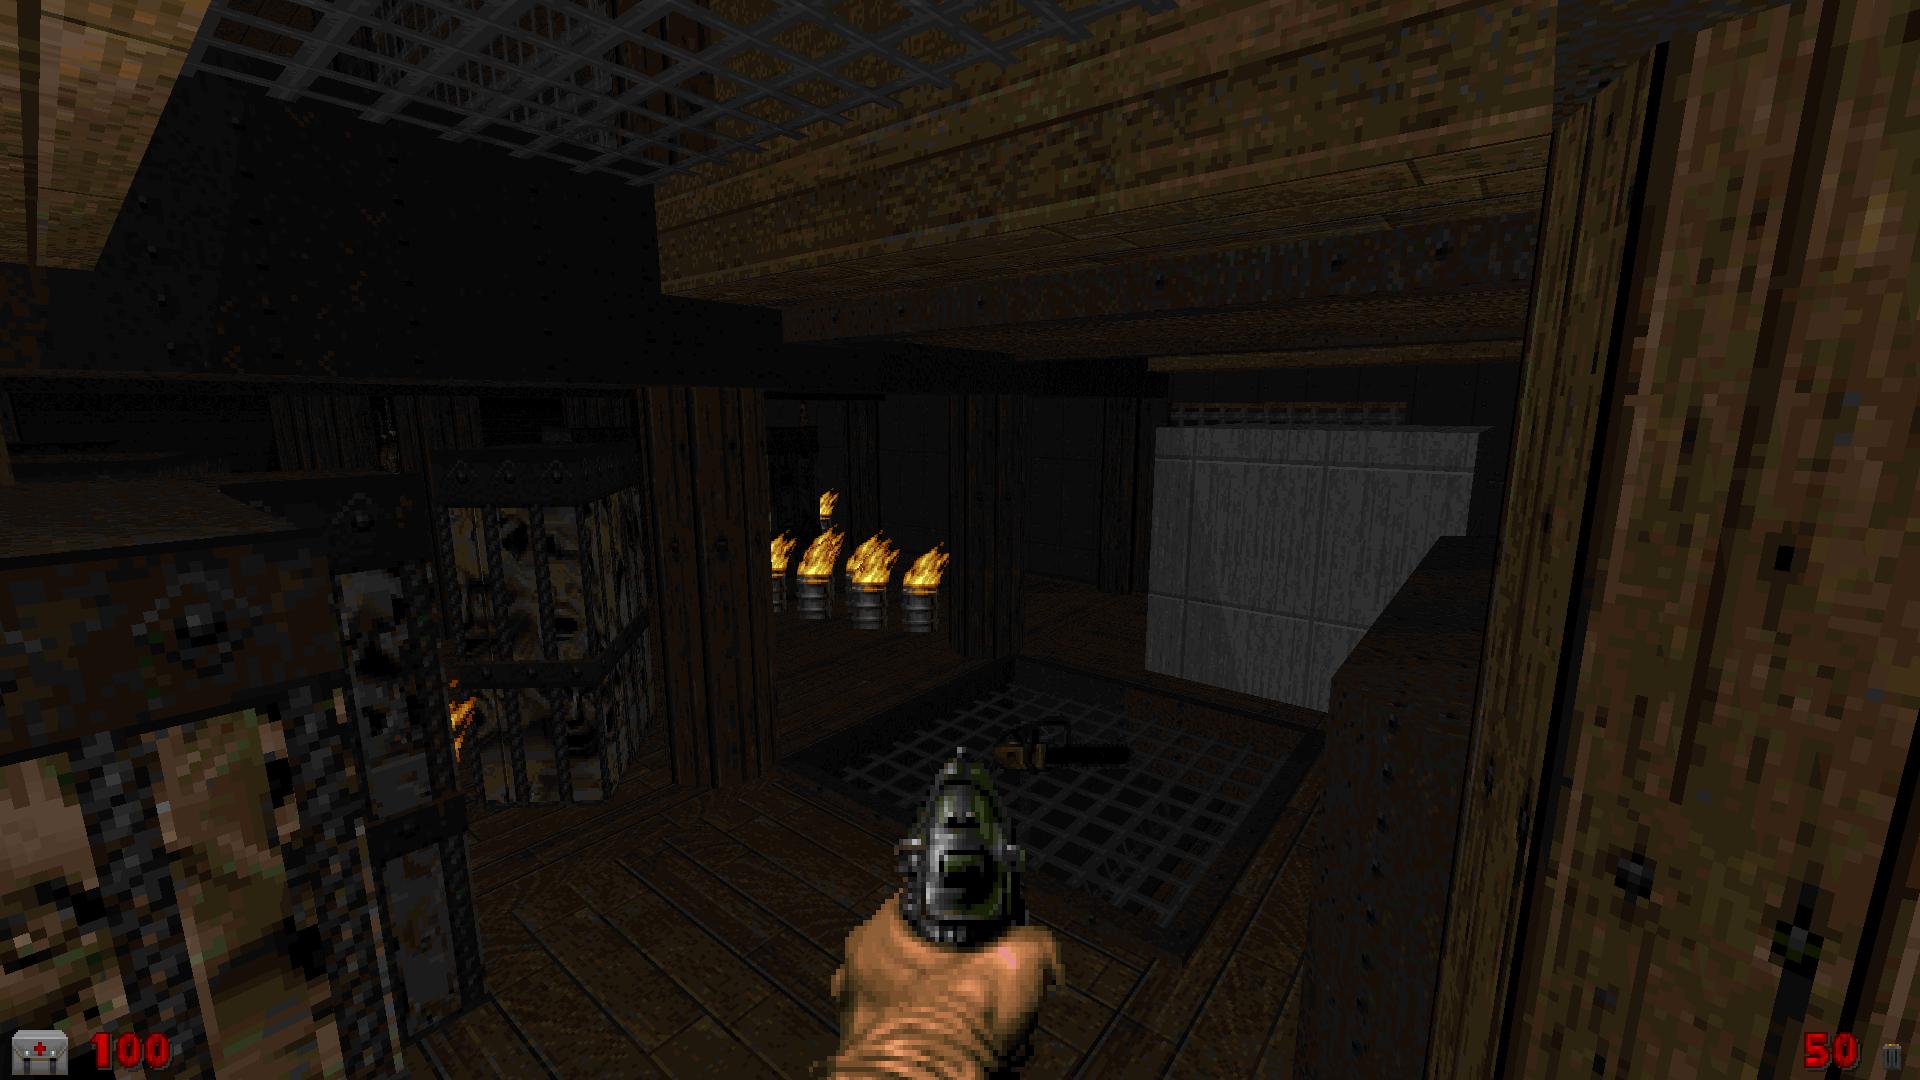 Screenshot_Doom_20200502_163345.png.acc5b35650ba491e0c41b5ec1c6c7468.png